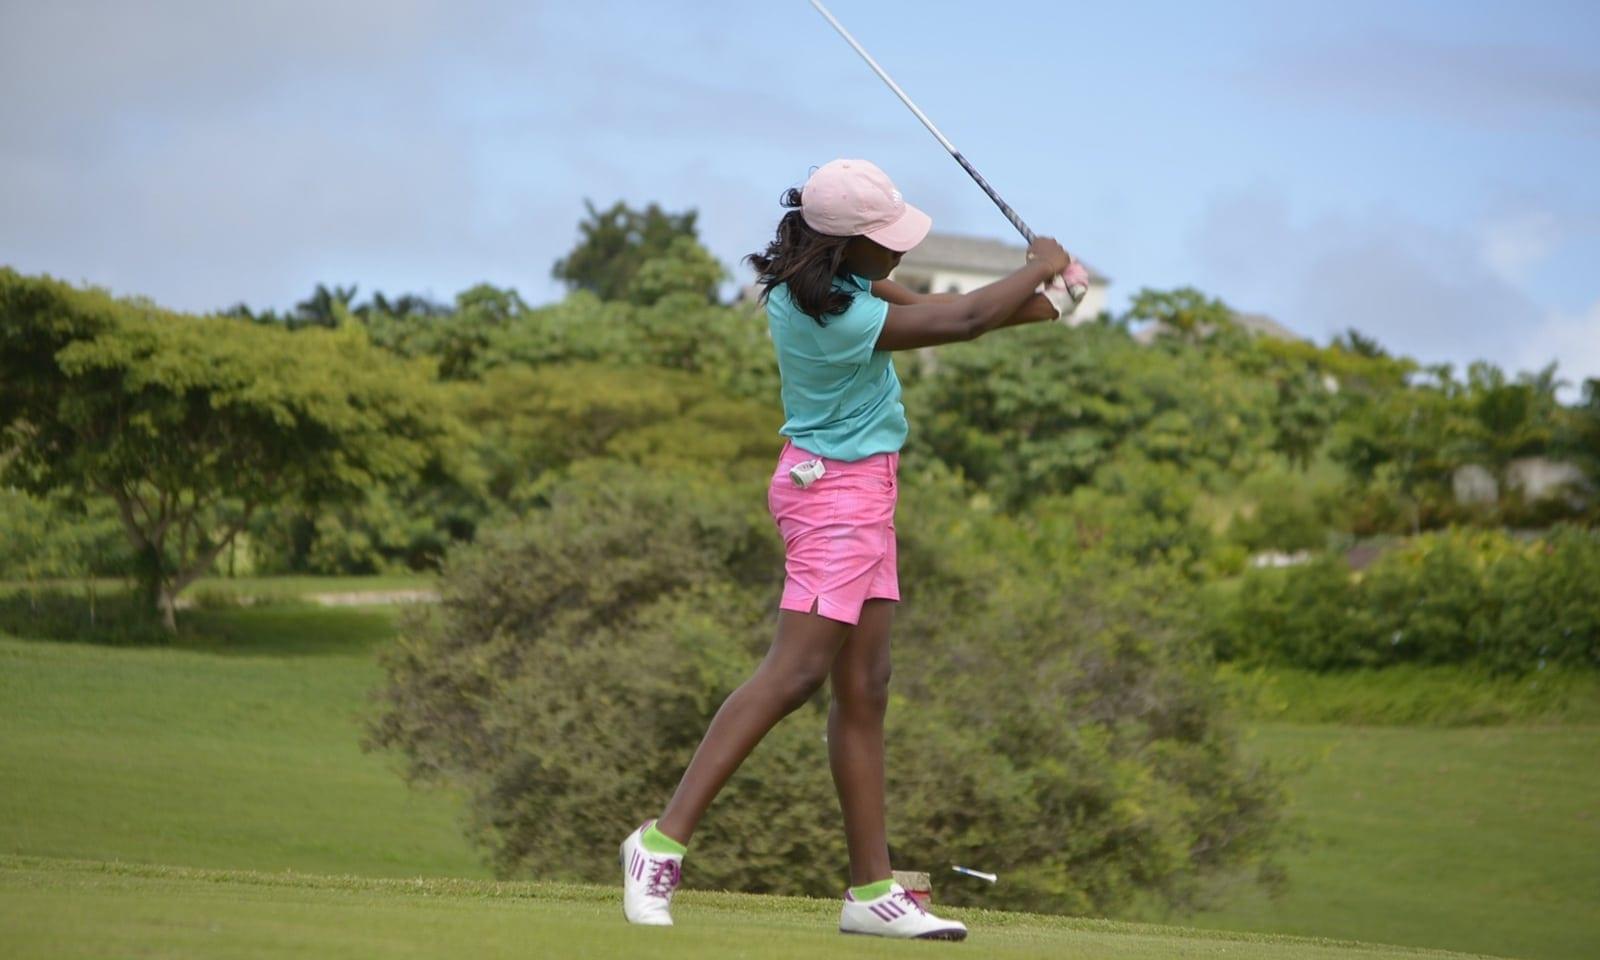 golf-shoe-image-2